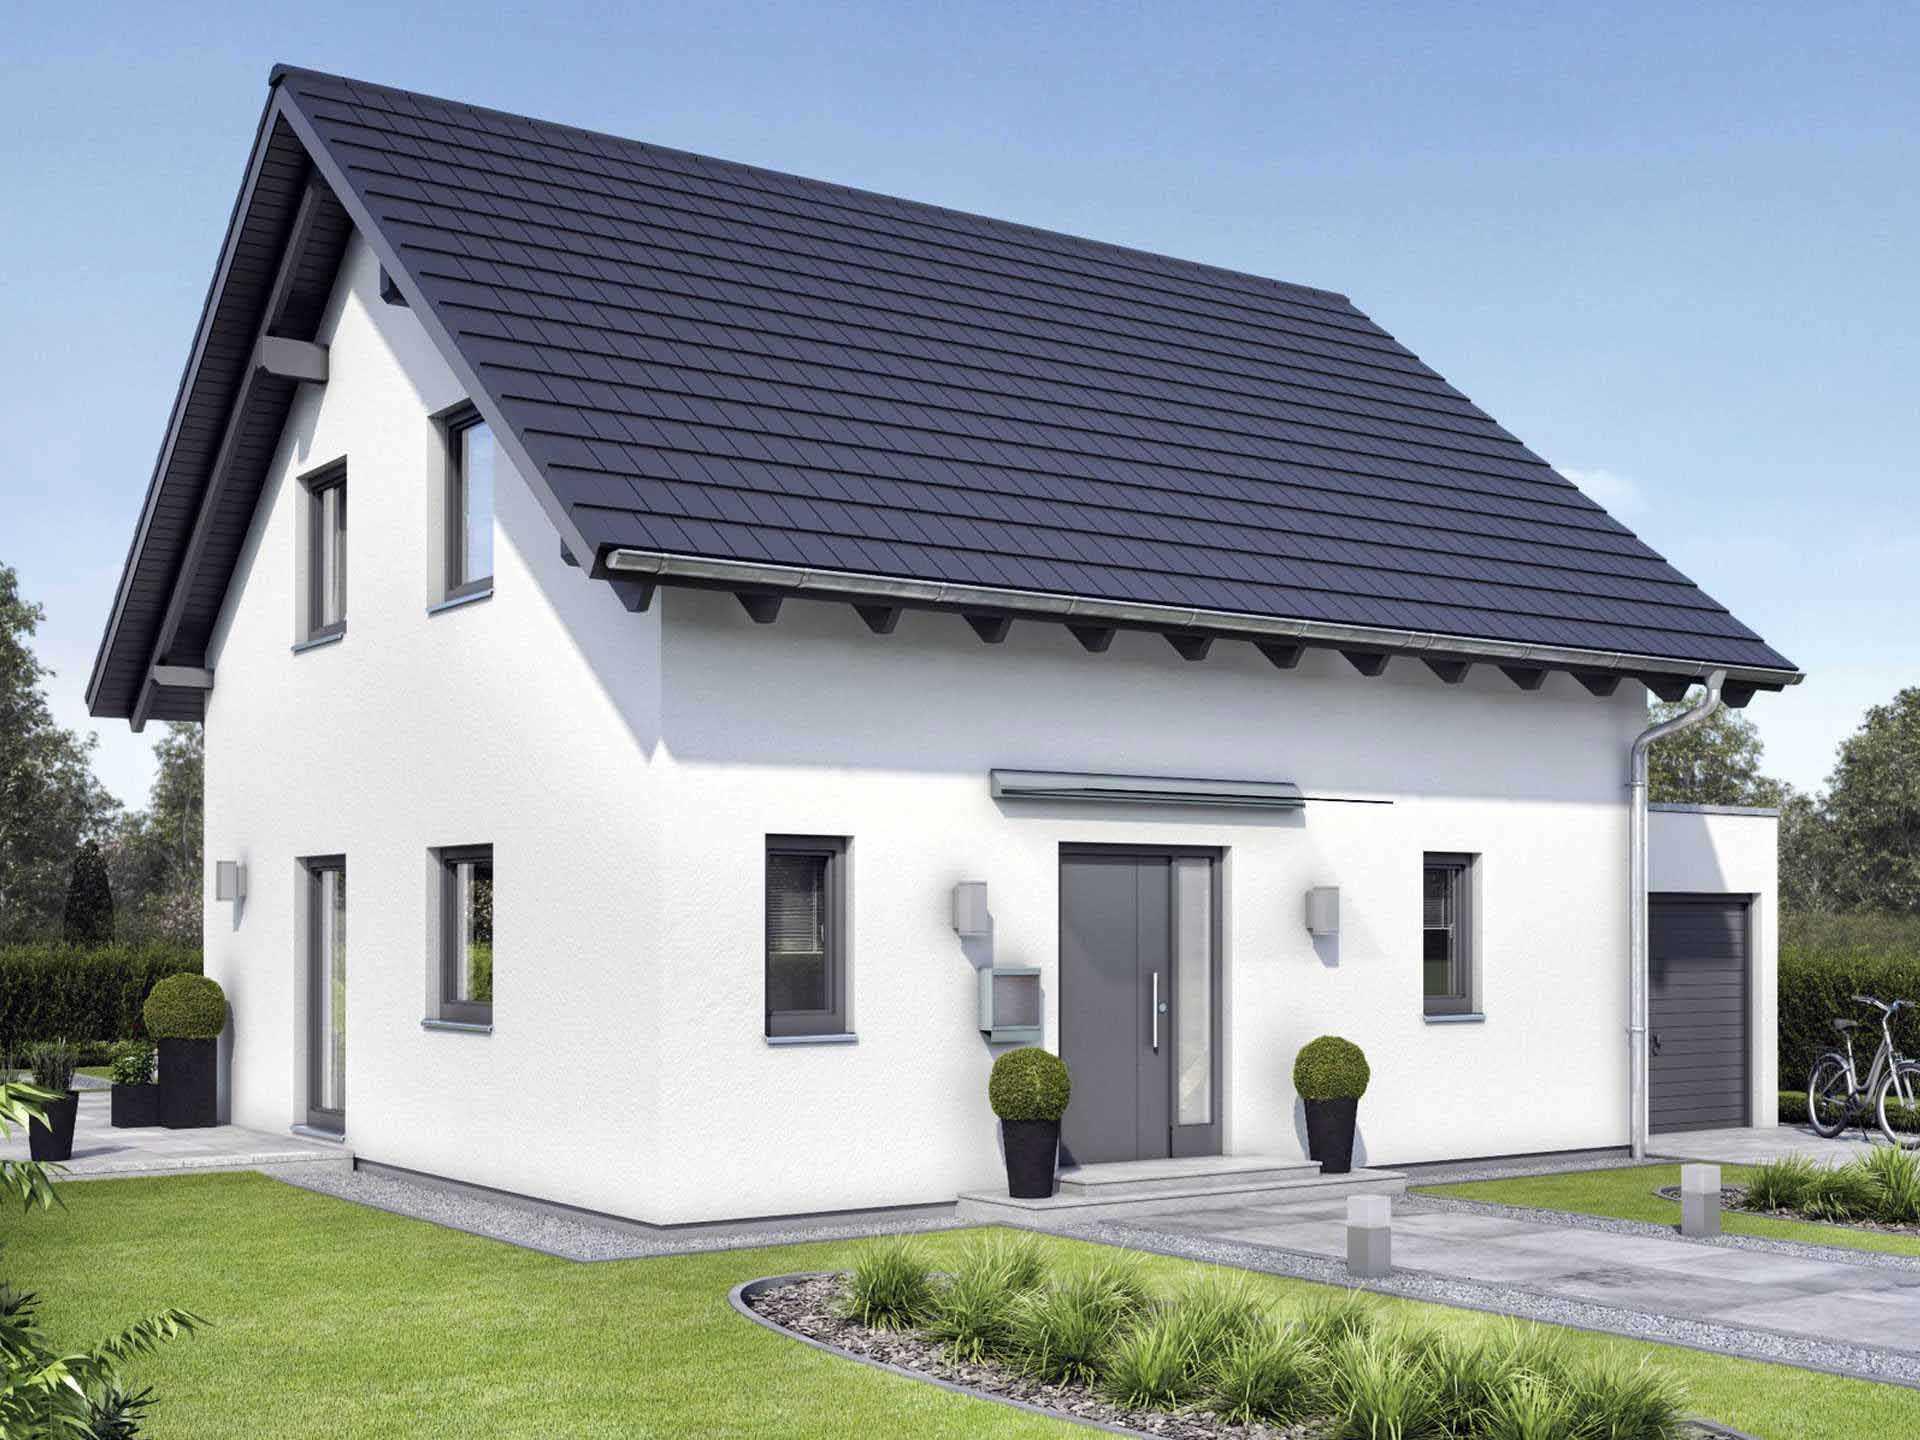 weber fertighaus preise. Black Bedroom Furniture Sets. Home Design Ideas